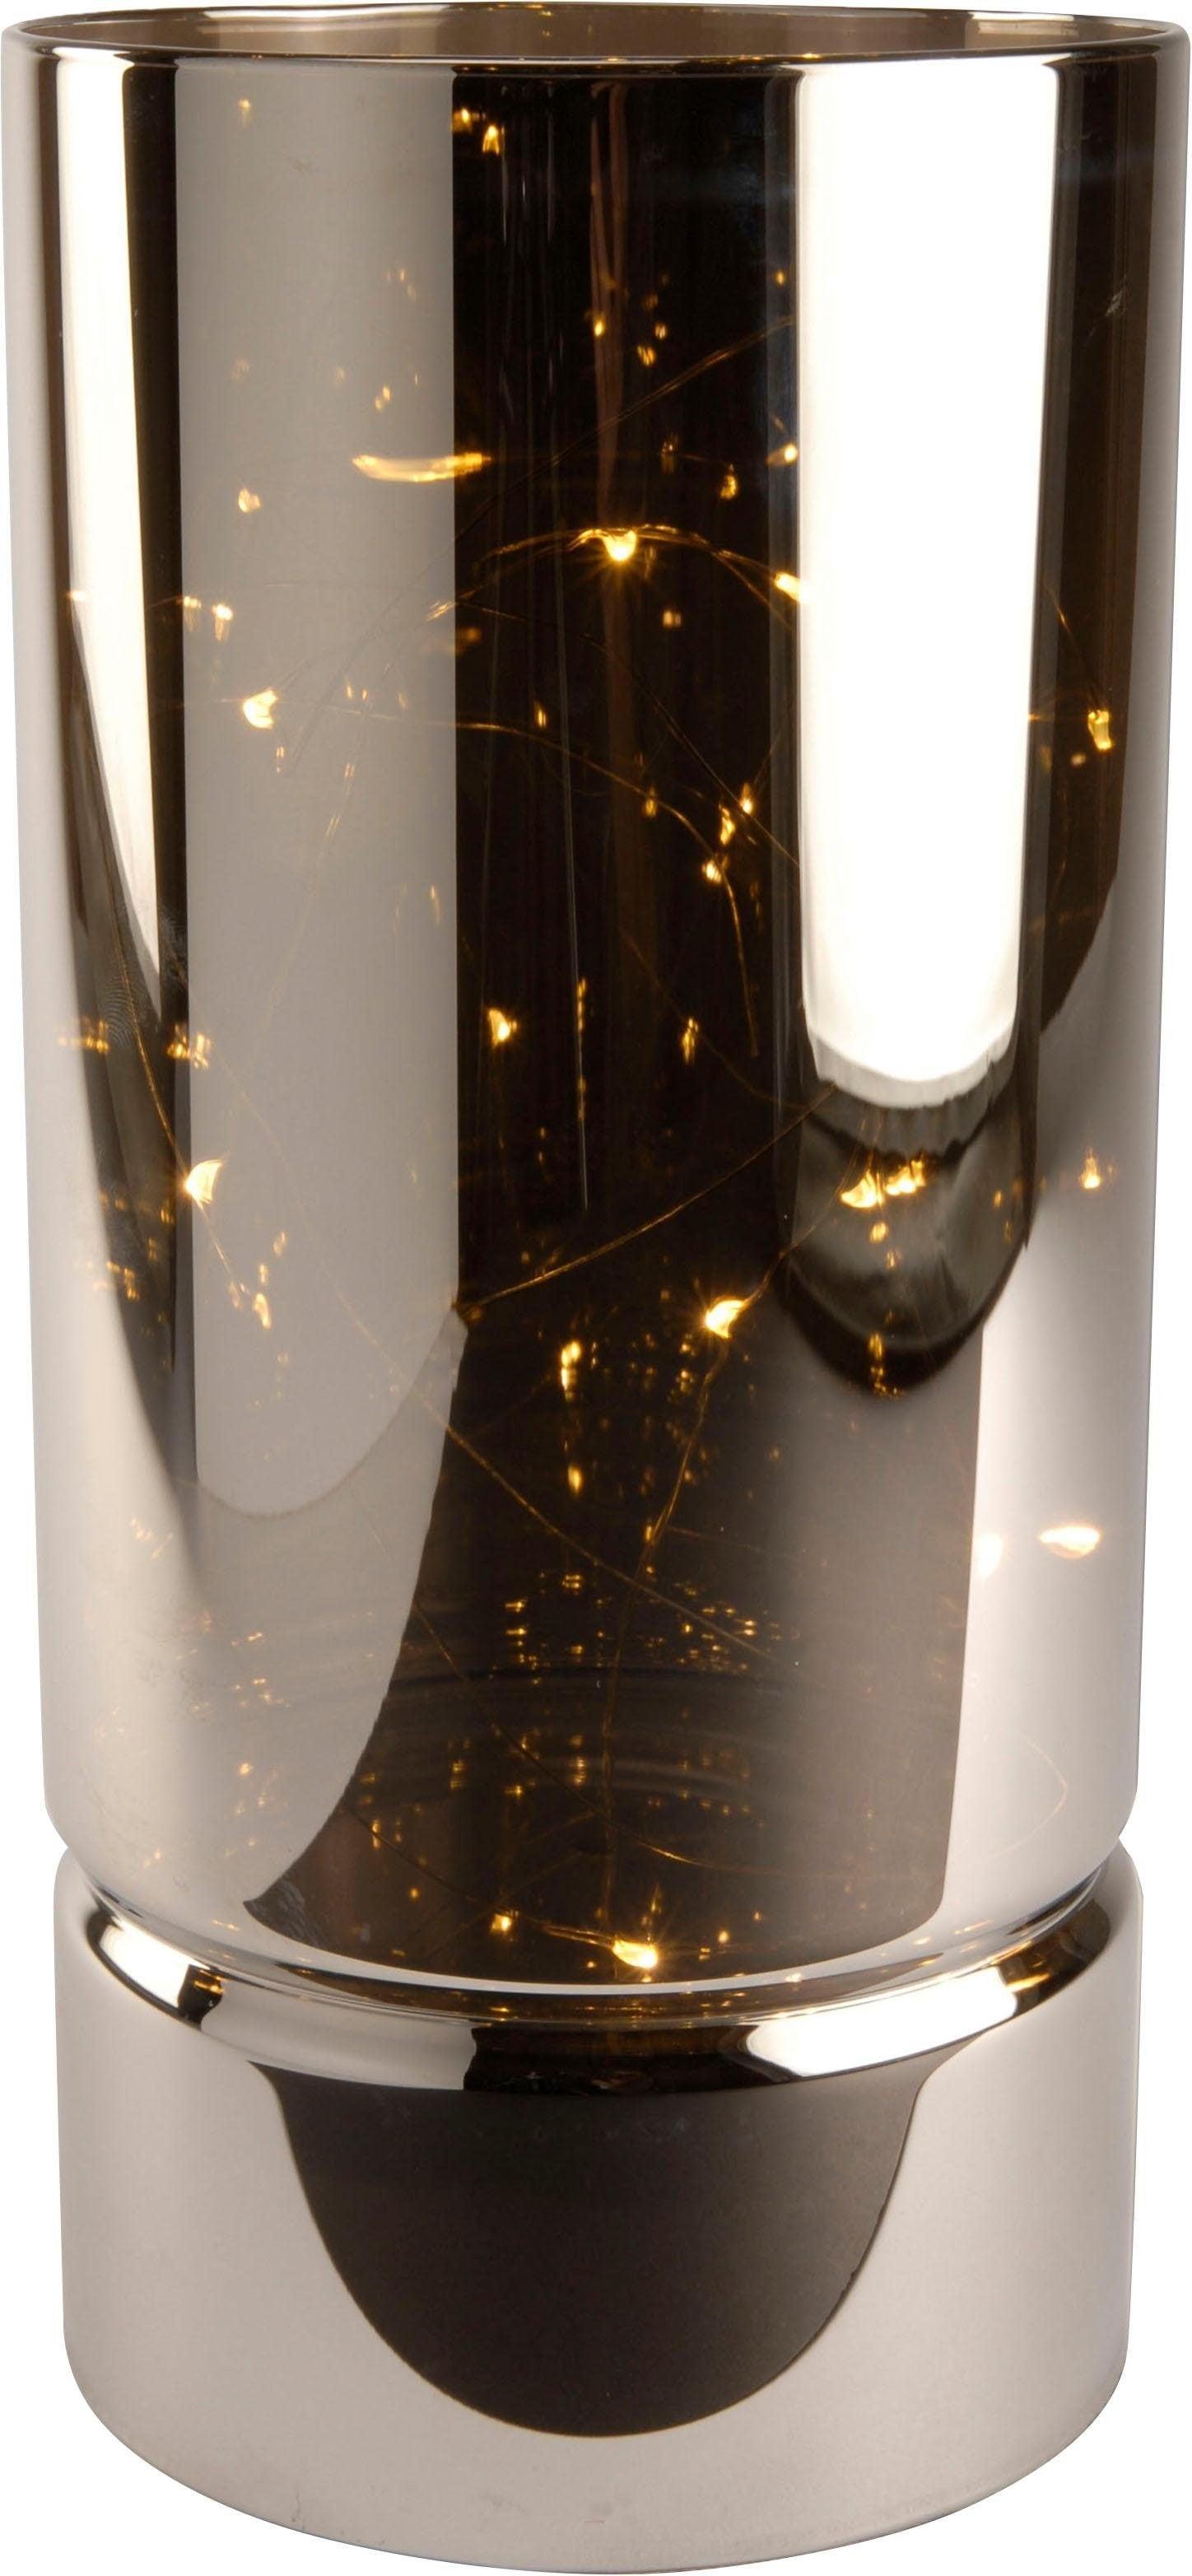 Laterne Wohnen/Accessoires & Leuchten/Wohnaccessoires/Kerzen & Laternen/Kerzenhalter